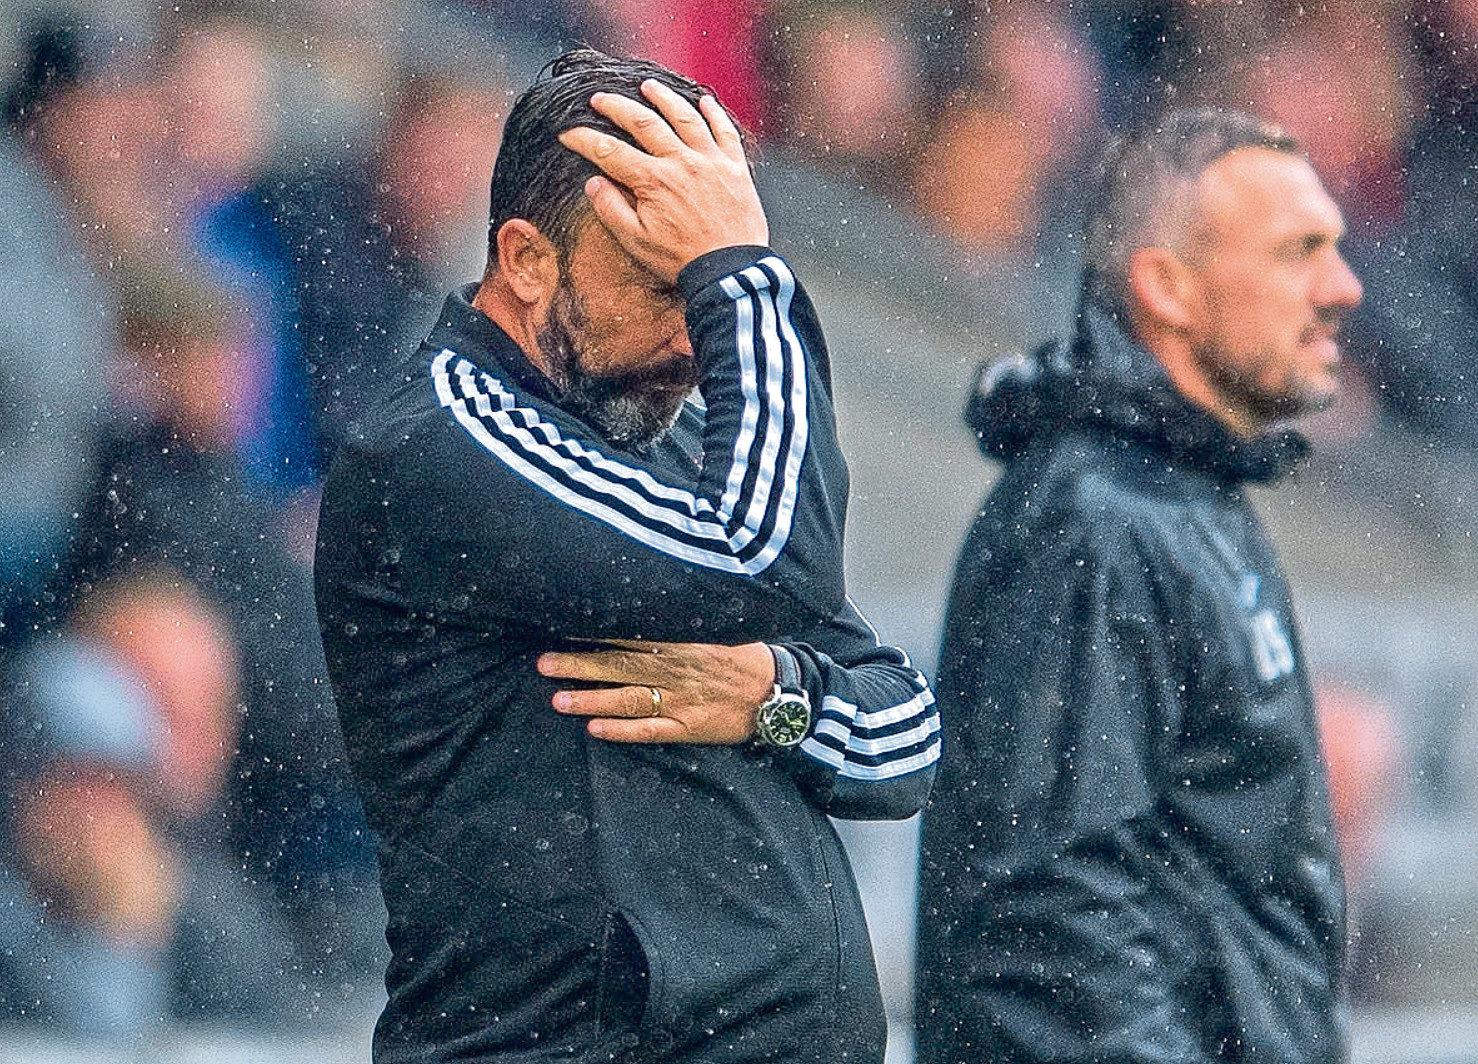 Aberdeen manager Derek McInnes looks dejected